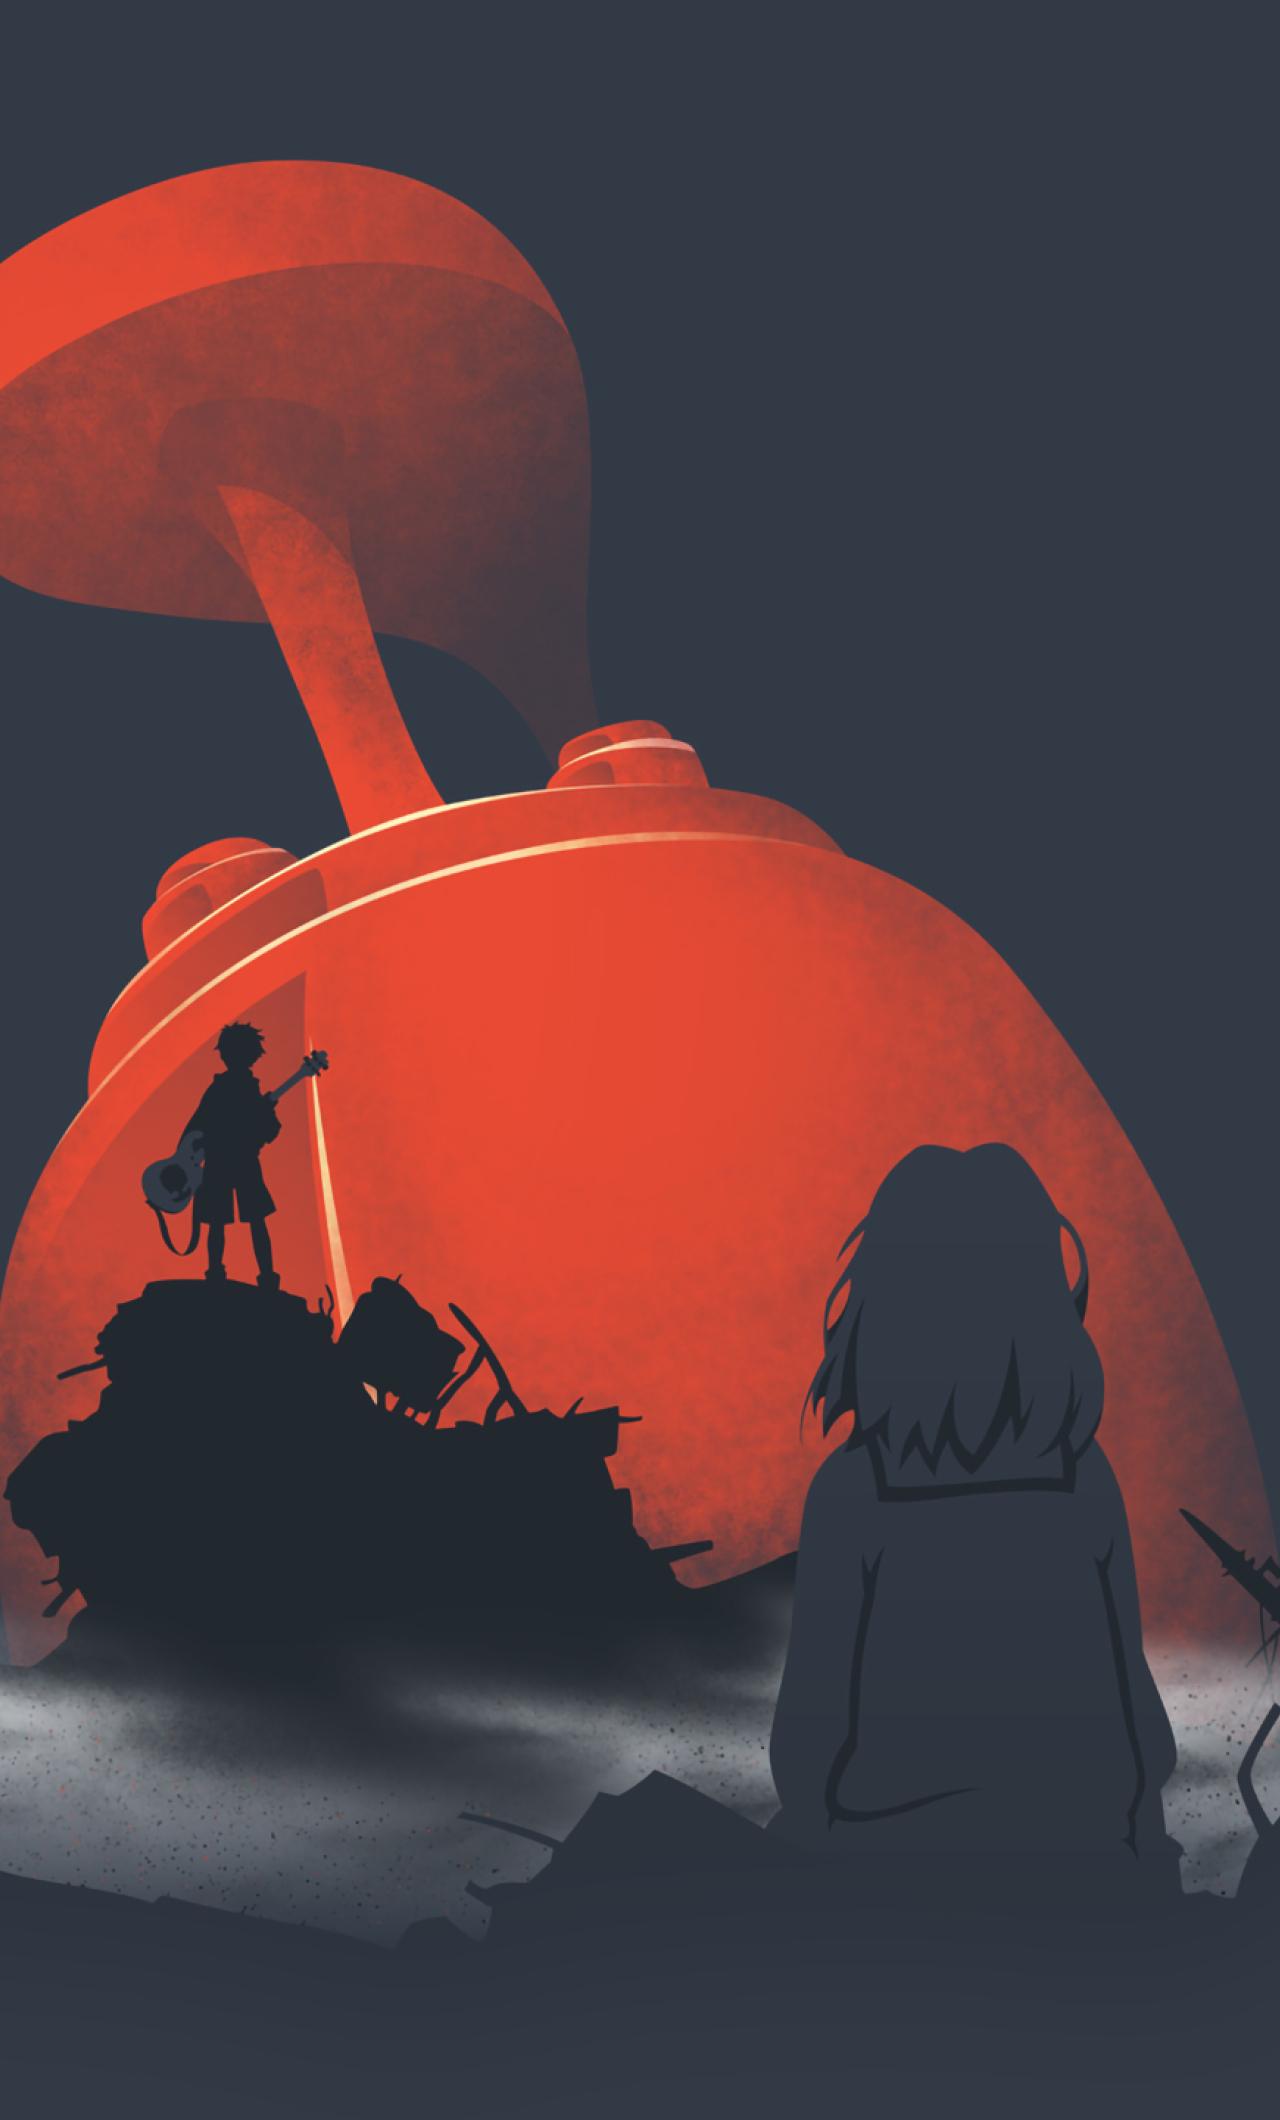 Download 1280x900 wallpaper silhouette, furi kuri, anime, artwork.